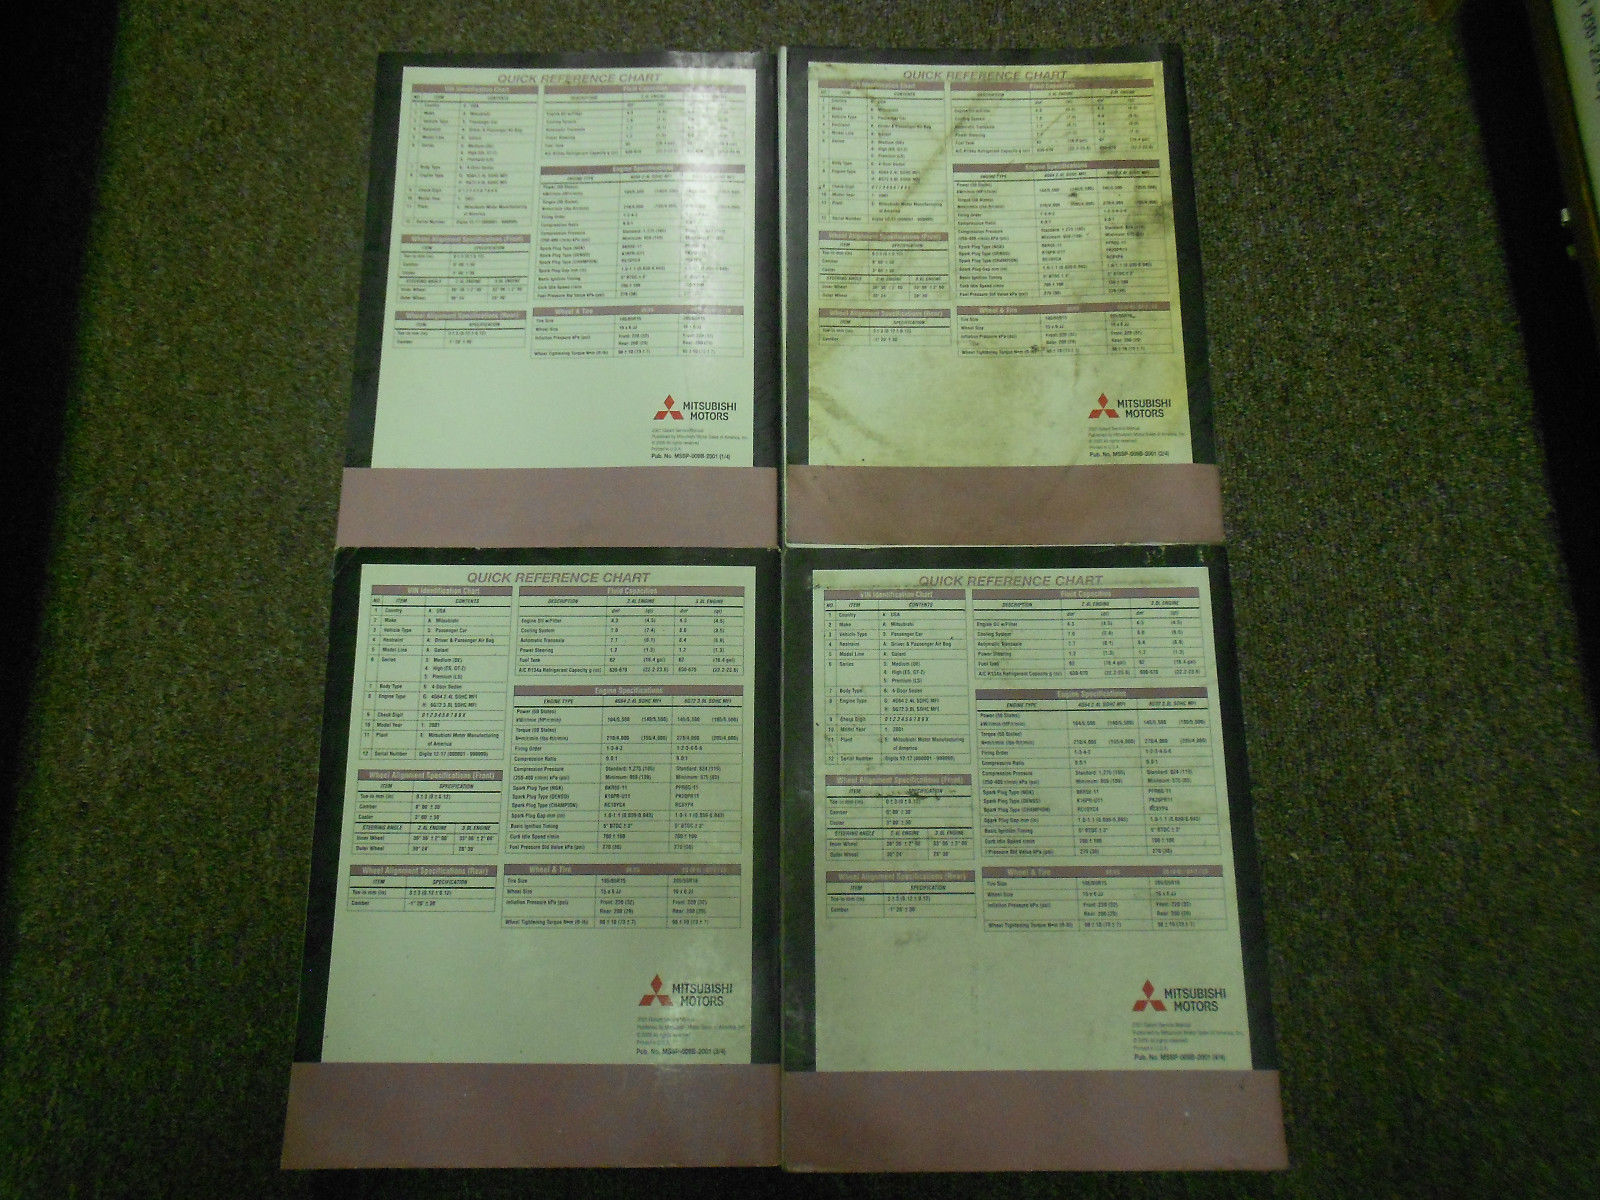 2001 MITSUBISHI Galant Service Repair Shop Manual FACTORY OEM SET BOOK x 4 VOL image 7